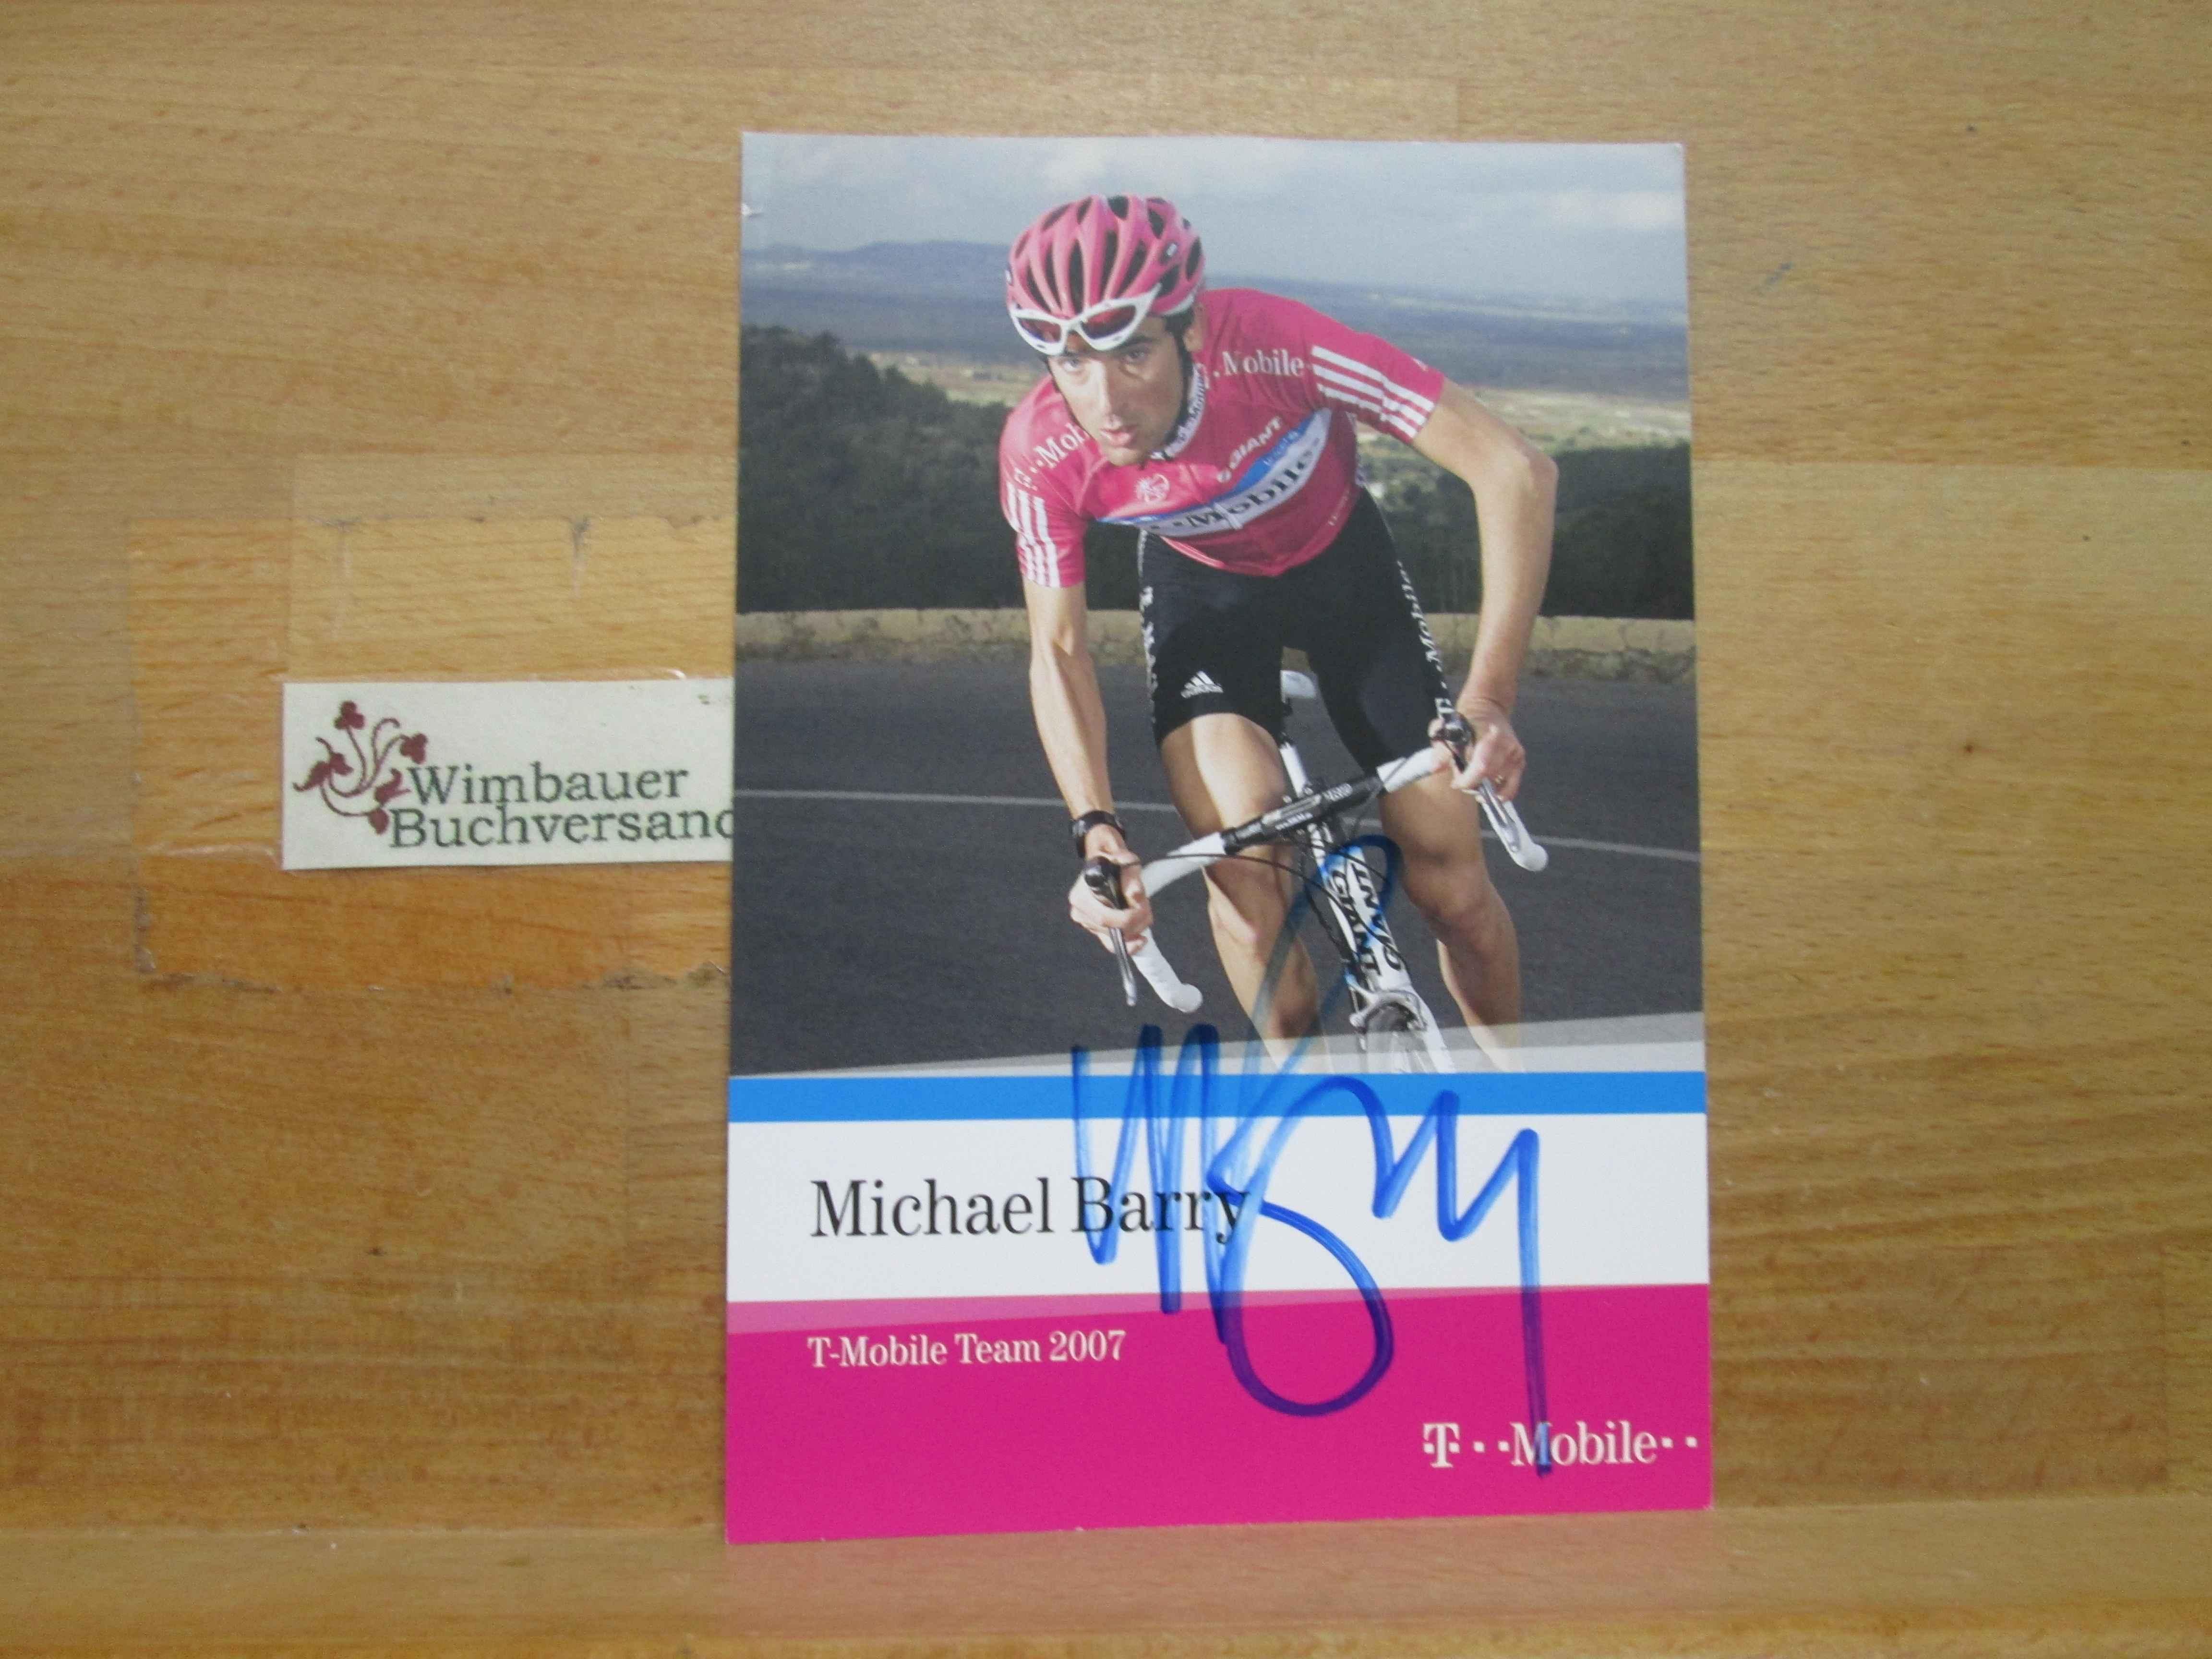 Original Autogramm Michael Barry Radsport T Mobile /// Autogramm Autograph signiert signed signee